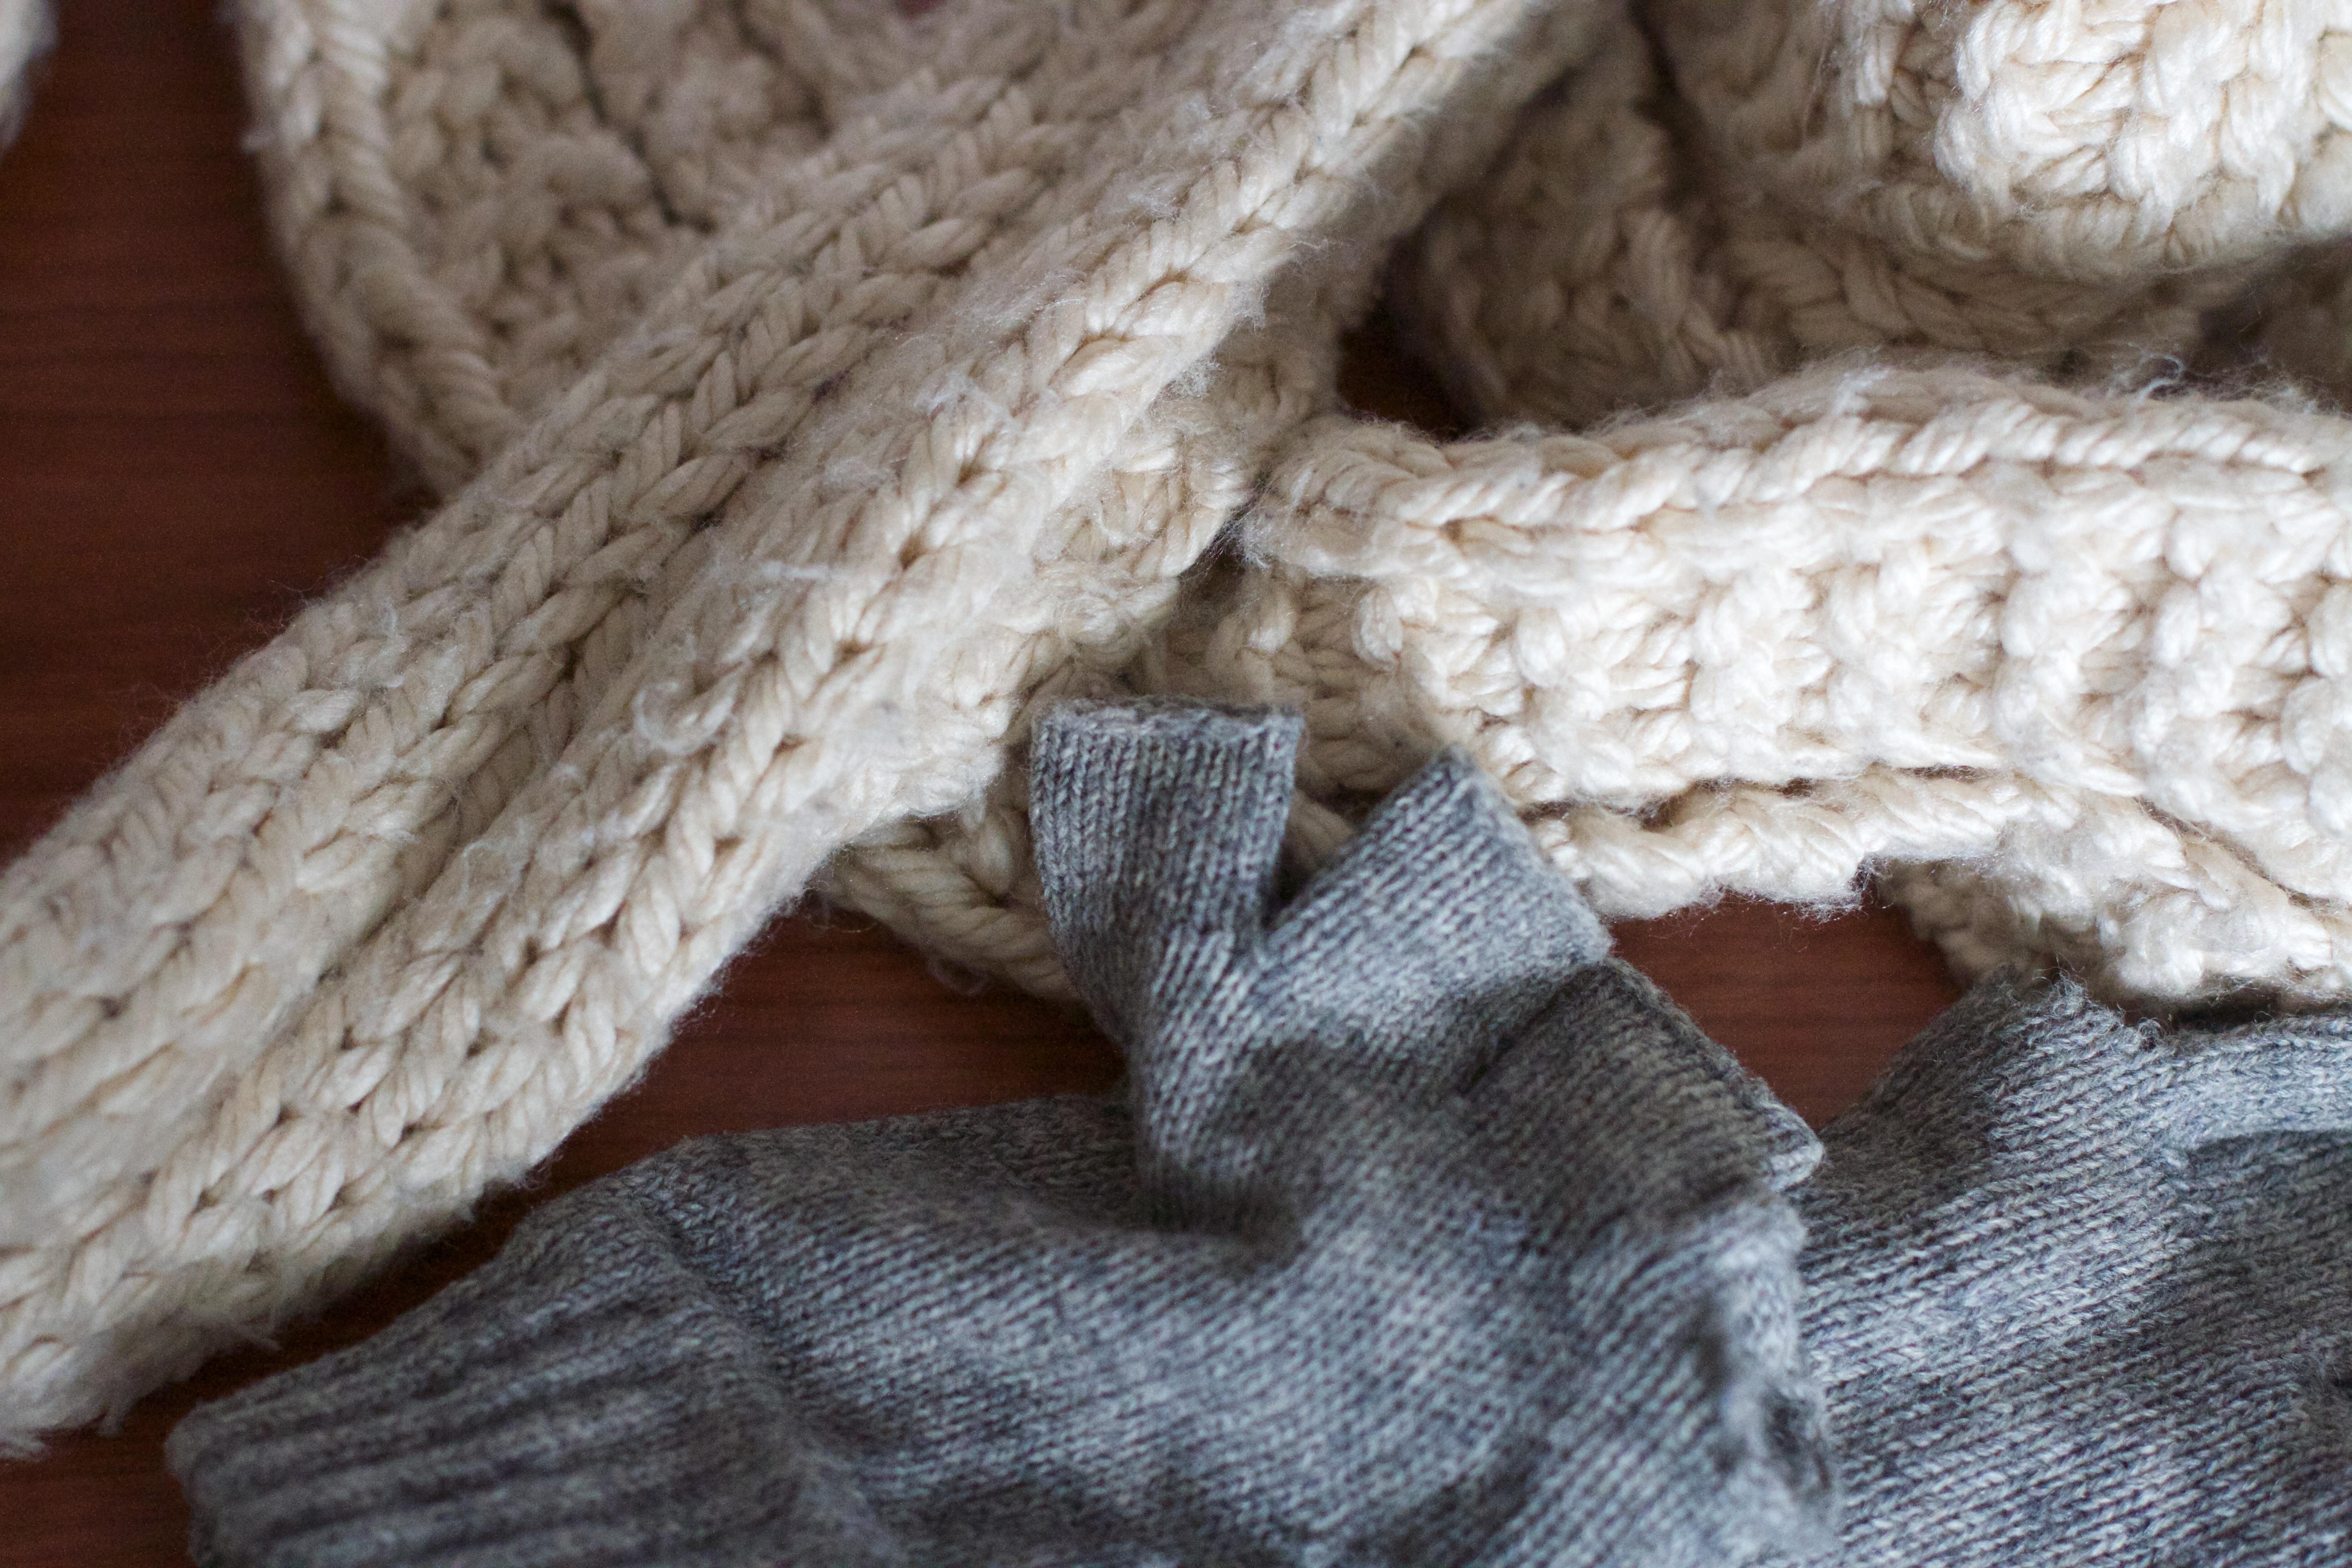 Kostenlose foto : Pelz, Muster, Kleidung, Wolle, Material, häkeln ...